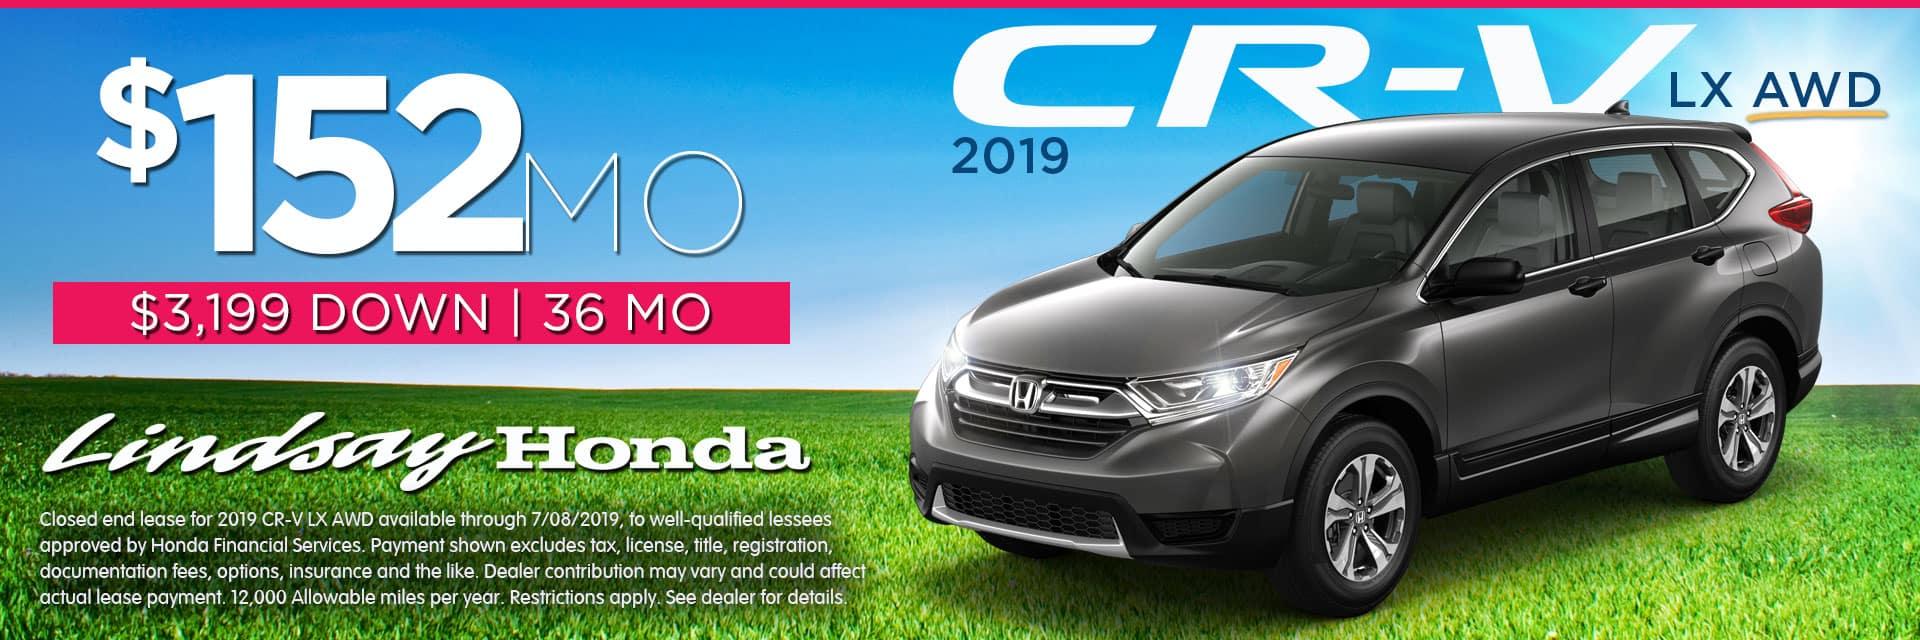 Honda Car Lease >> Lindsay Honda Honda Dealer In Columbus Oh